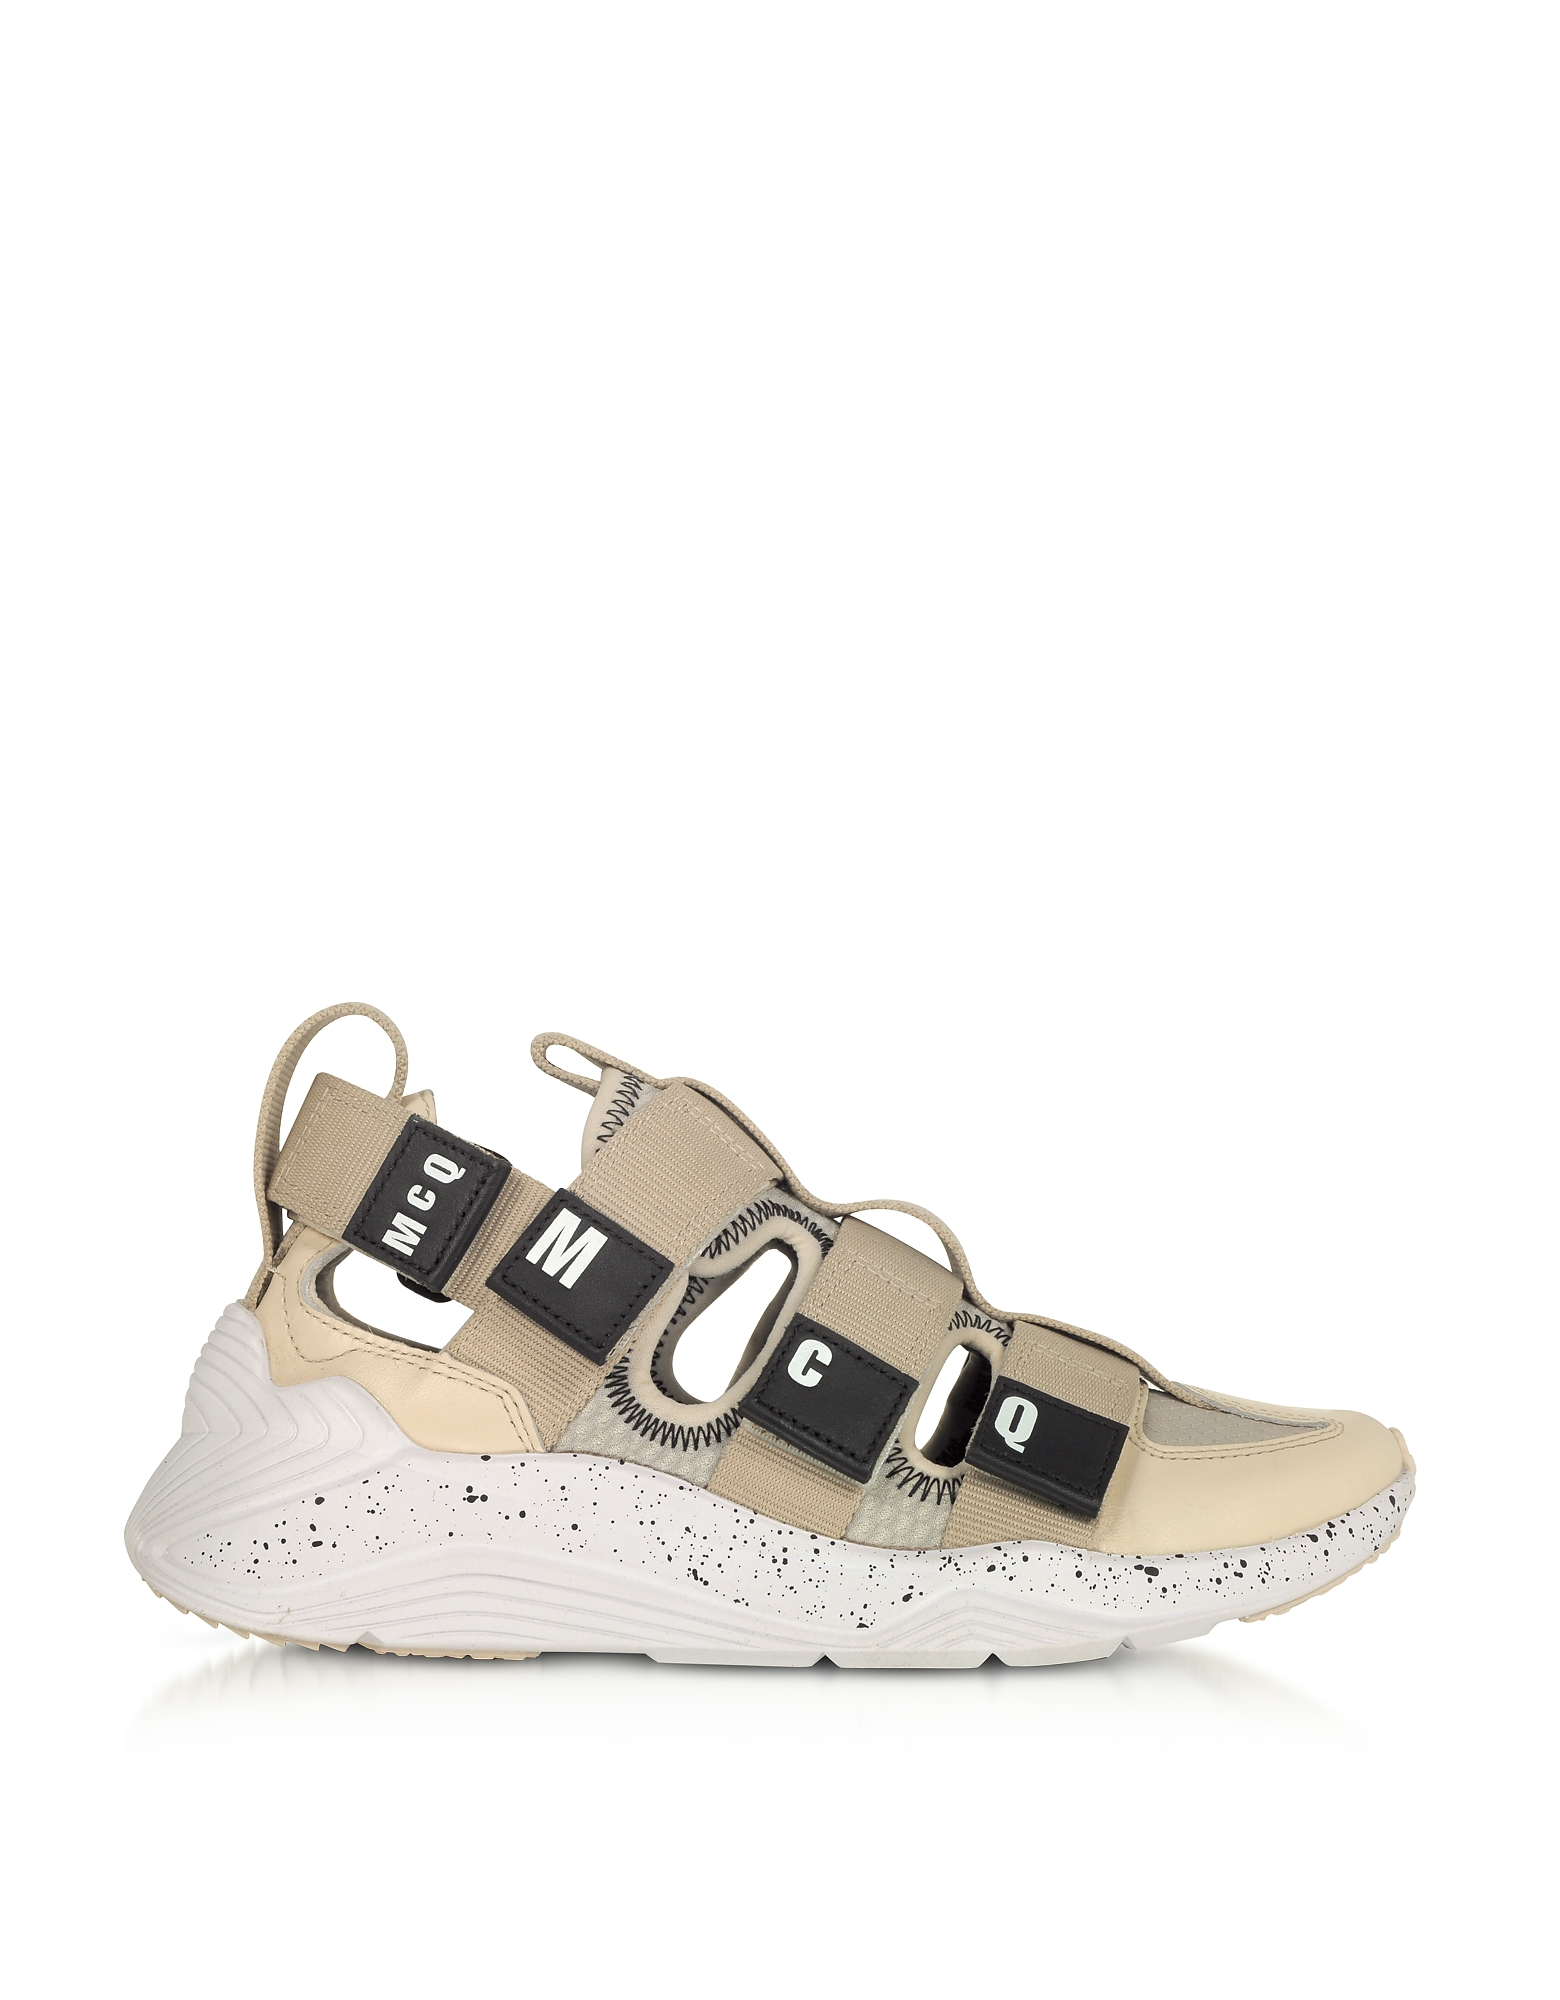 McQ Alexander McQueen Designer Shoes, Off White Tech Sandal 1.0 Sneakers